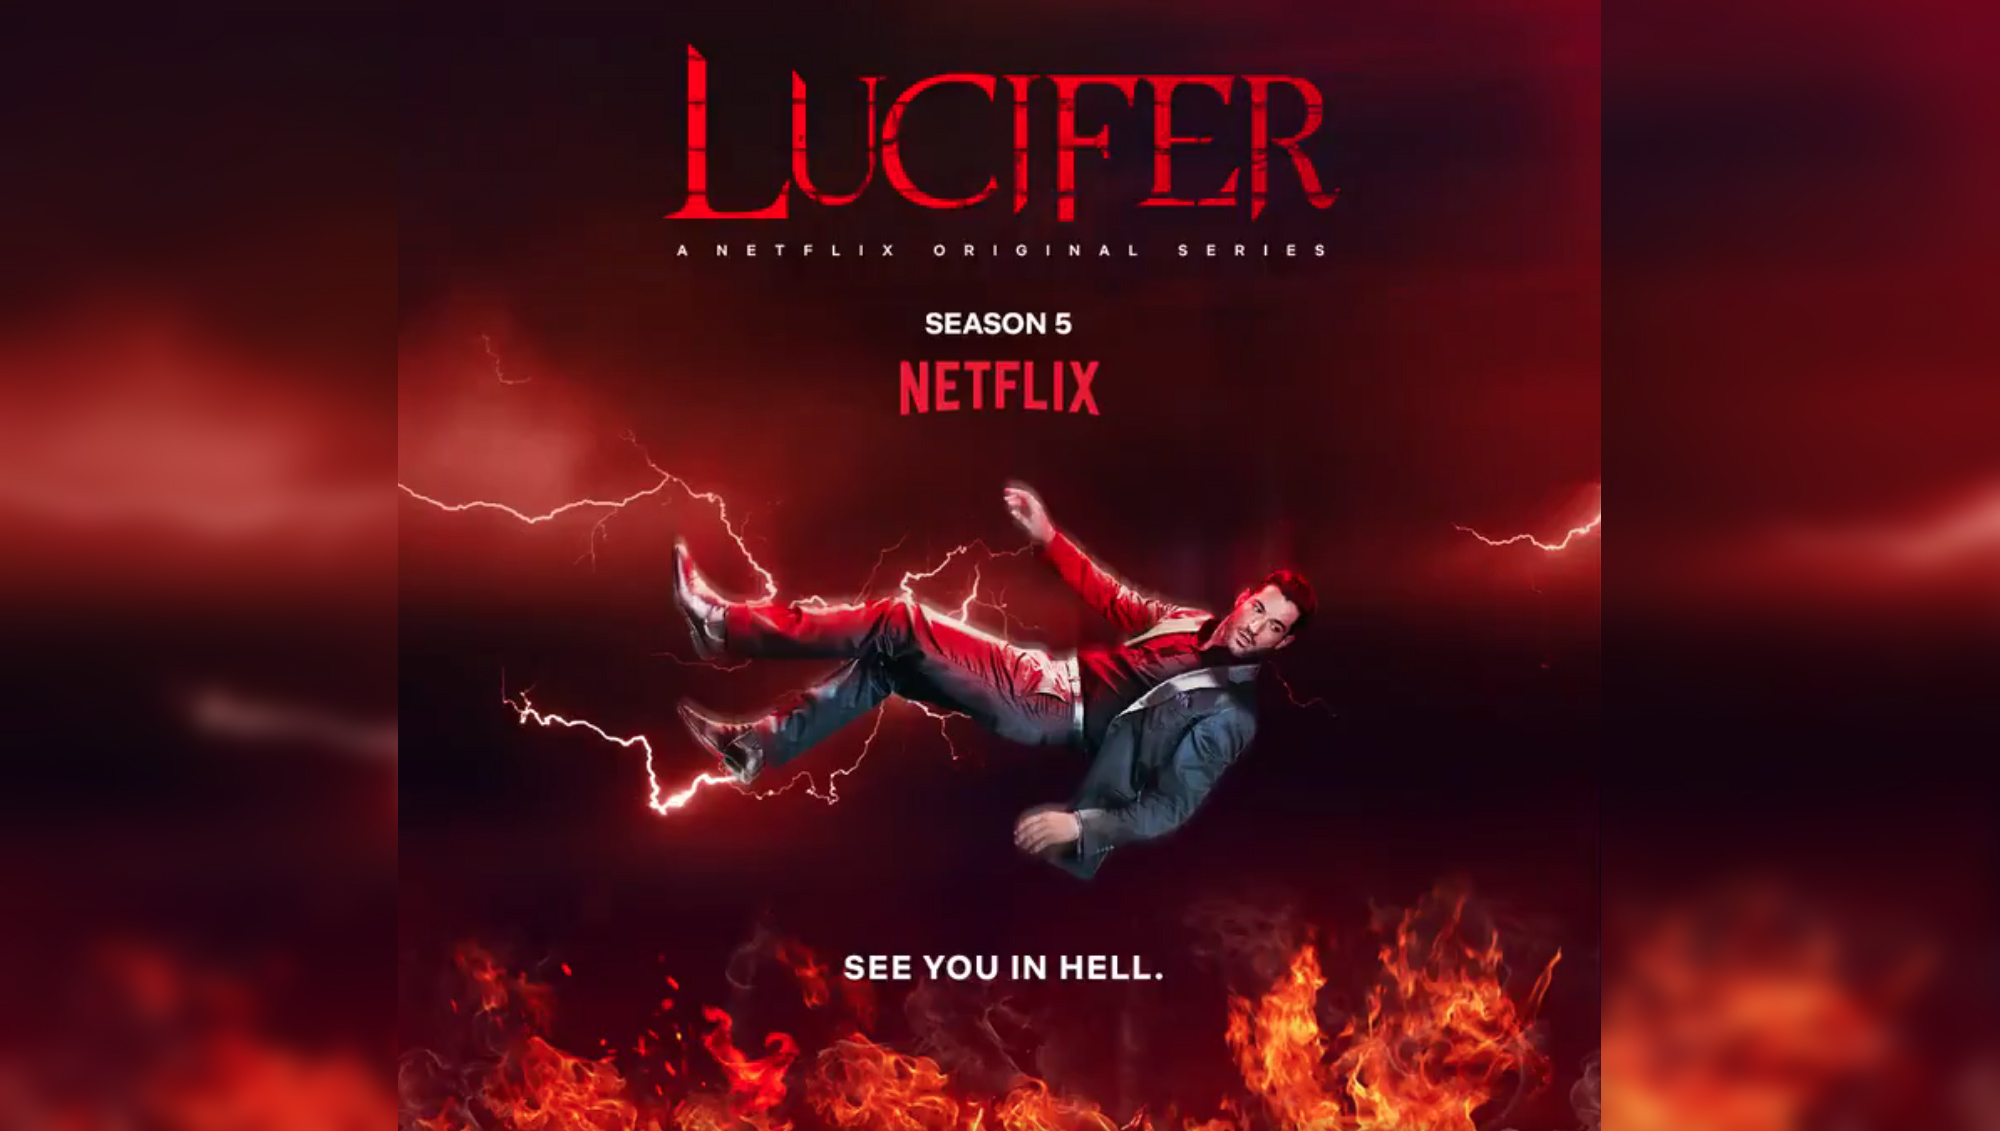 Lucifer 5 stagione netflix recensione analisi trama spoiler chloe michael amenadiel ella maze lilith